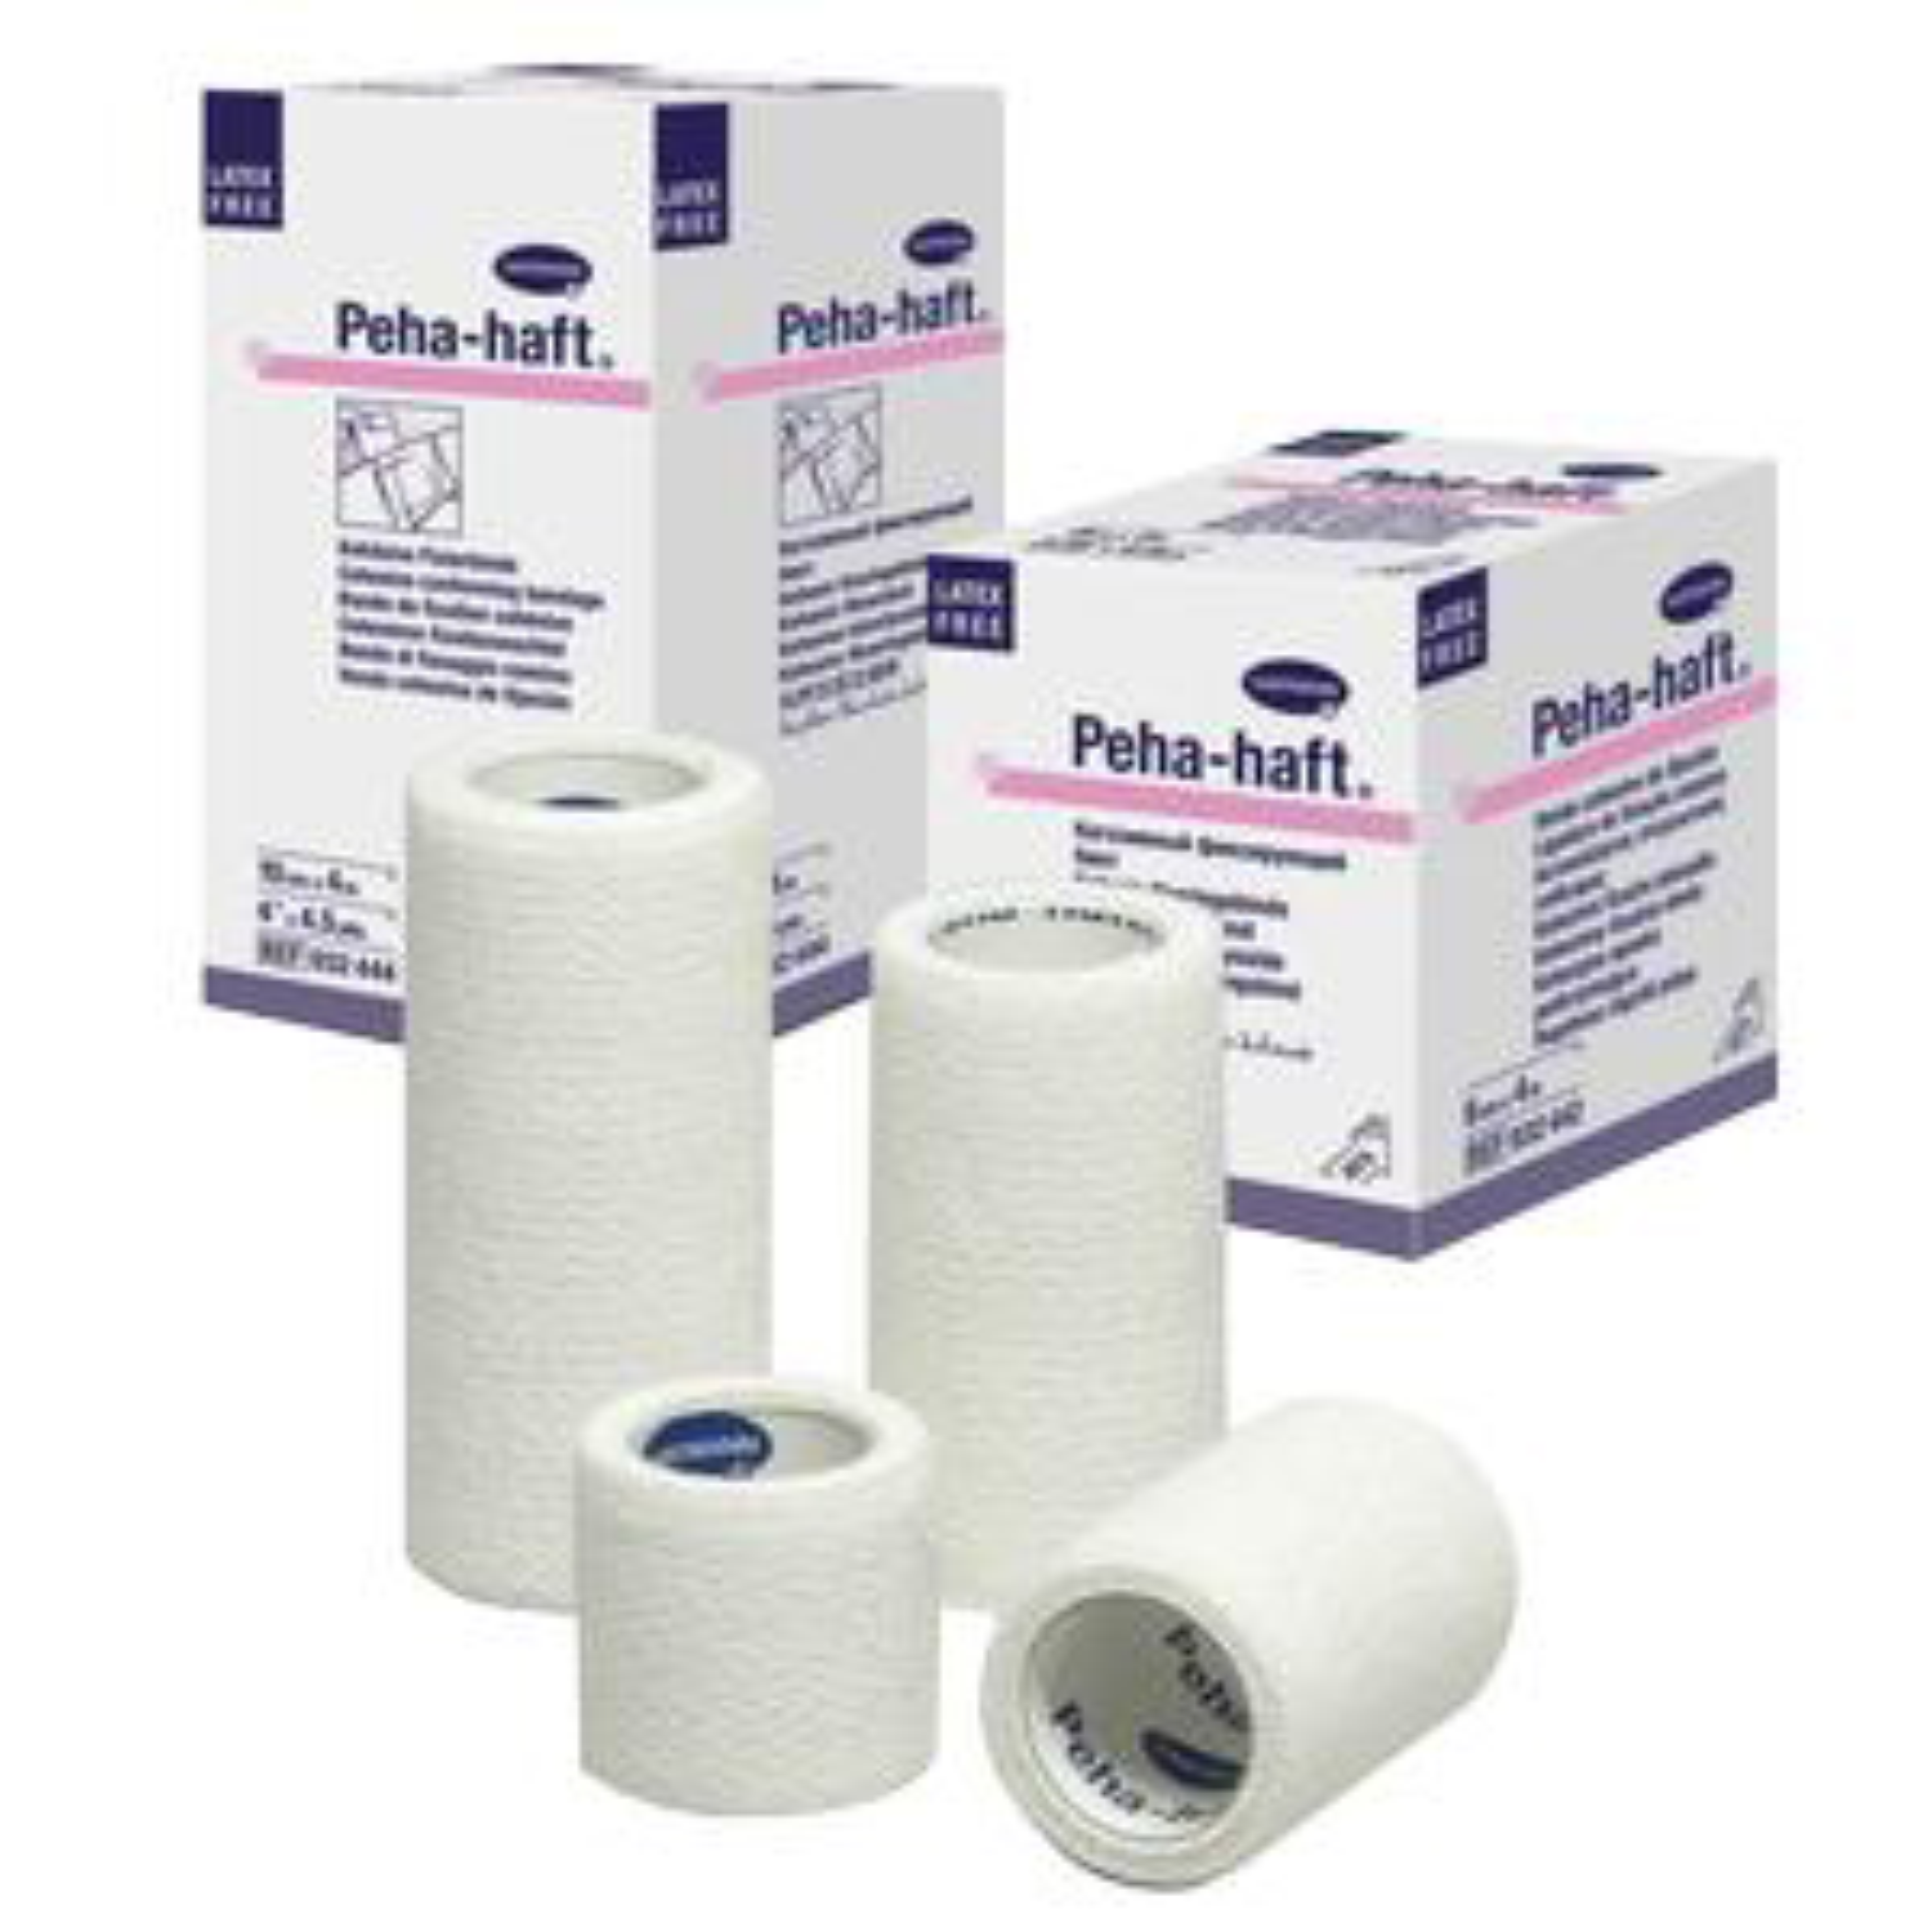 "Peha-Haft Absorbent Cohesive Conforming Gauze Bandage, Latex-Free, 1"" x 4-1/2 yards"